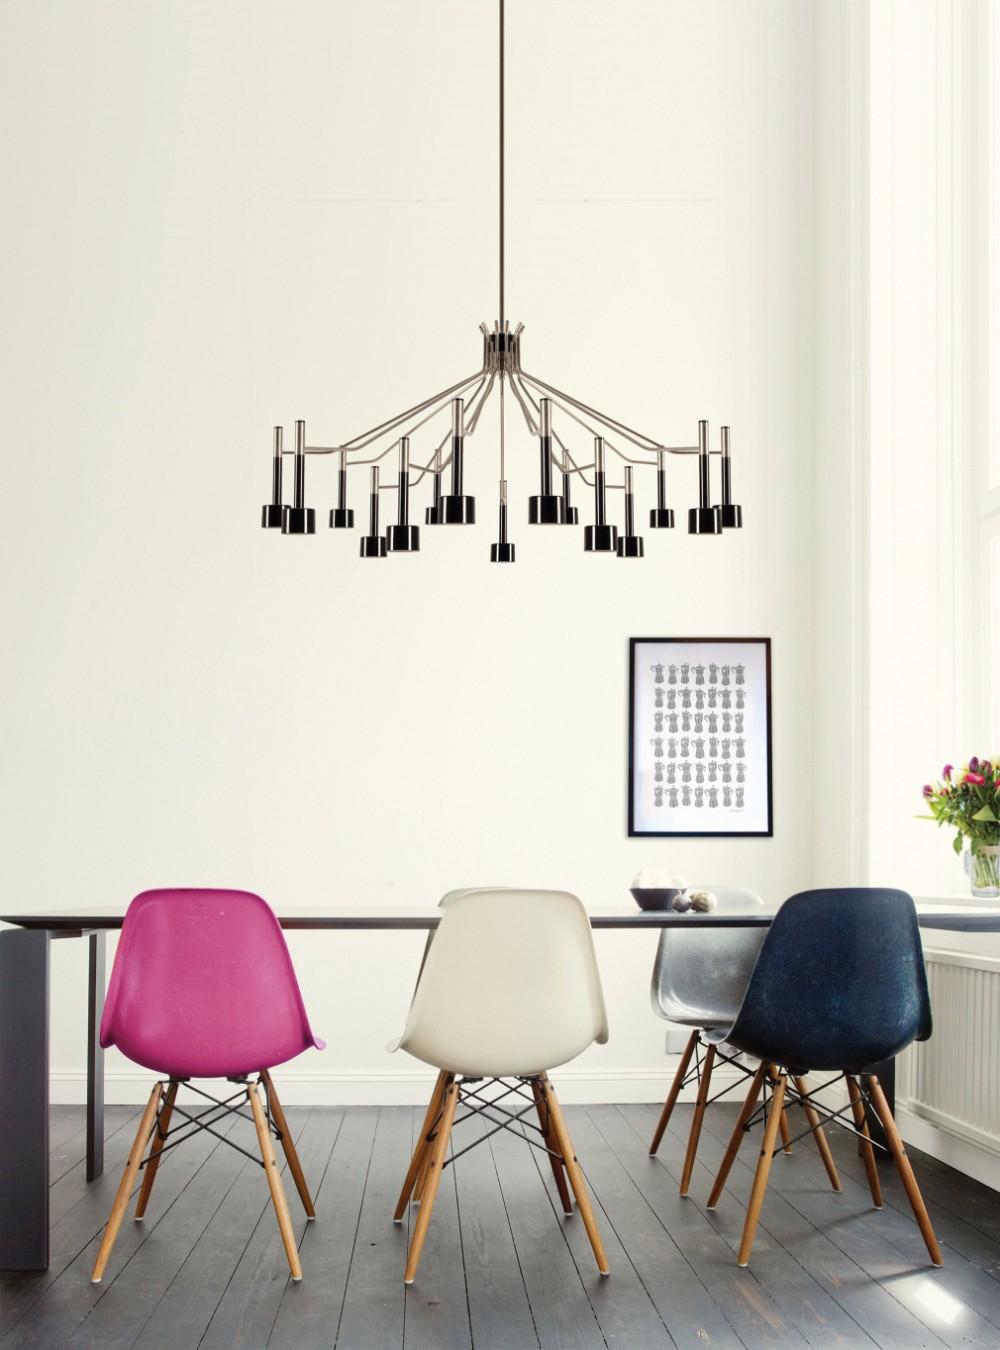 boho chic 25 Boho Chic Dining Room Designs That Will Inspire You 25 boho chic dining room designs that will inspire you 14